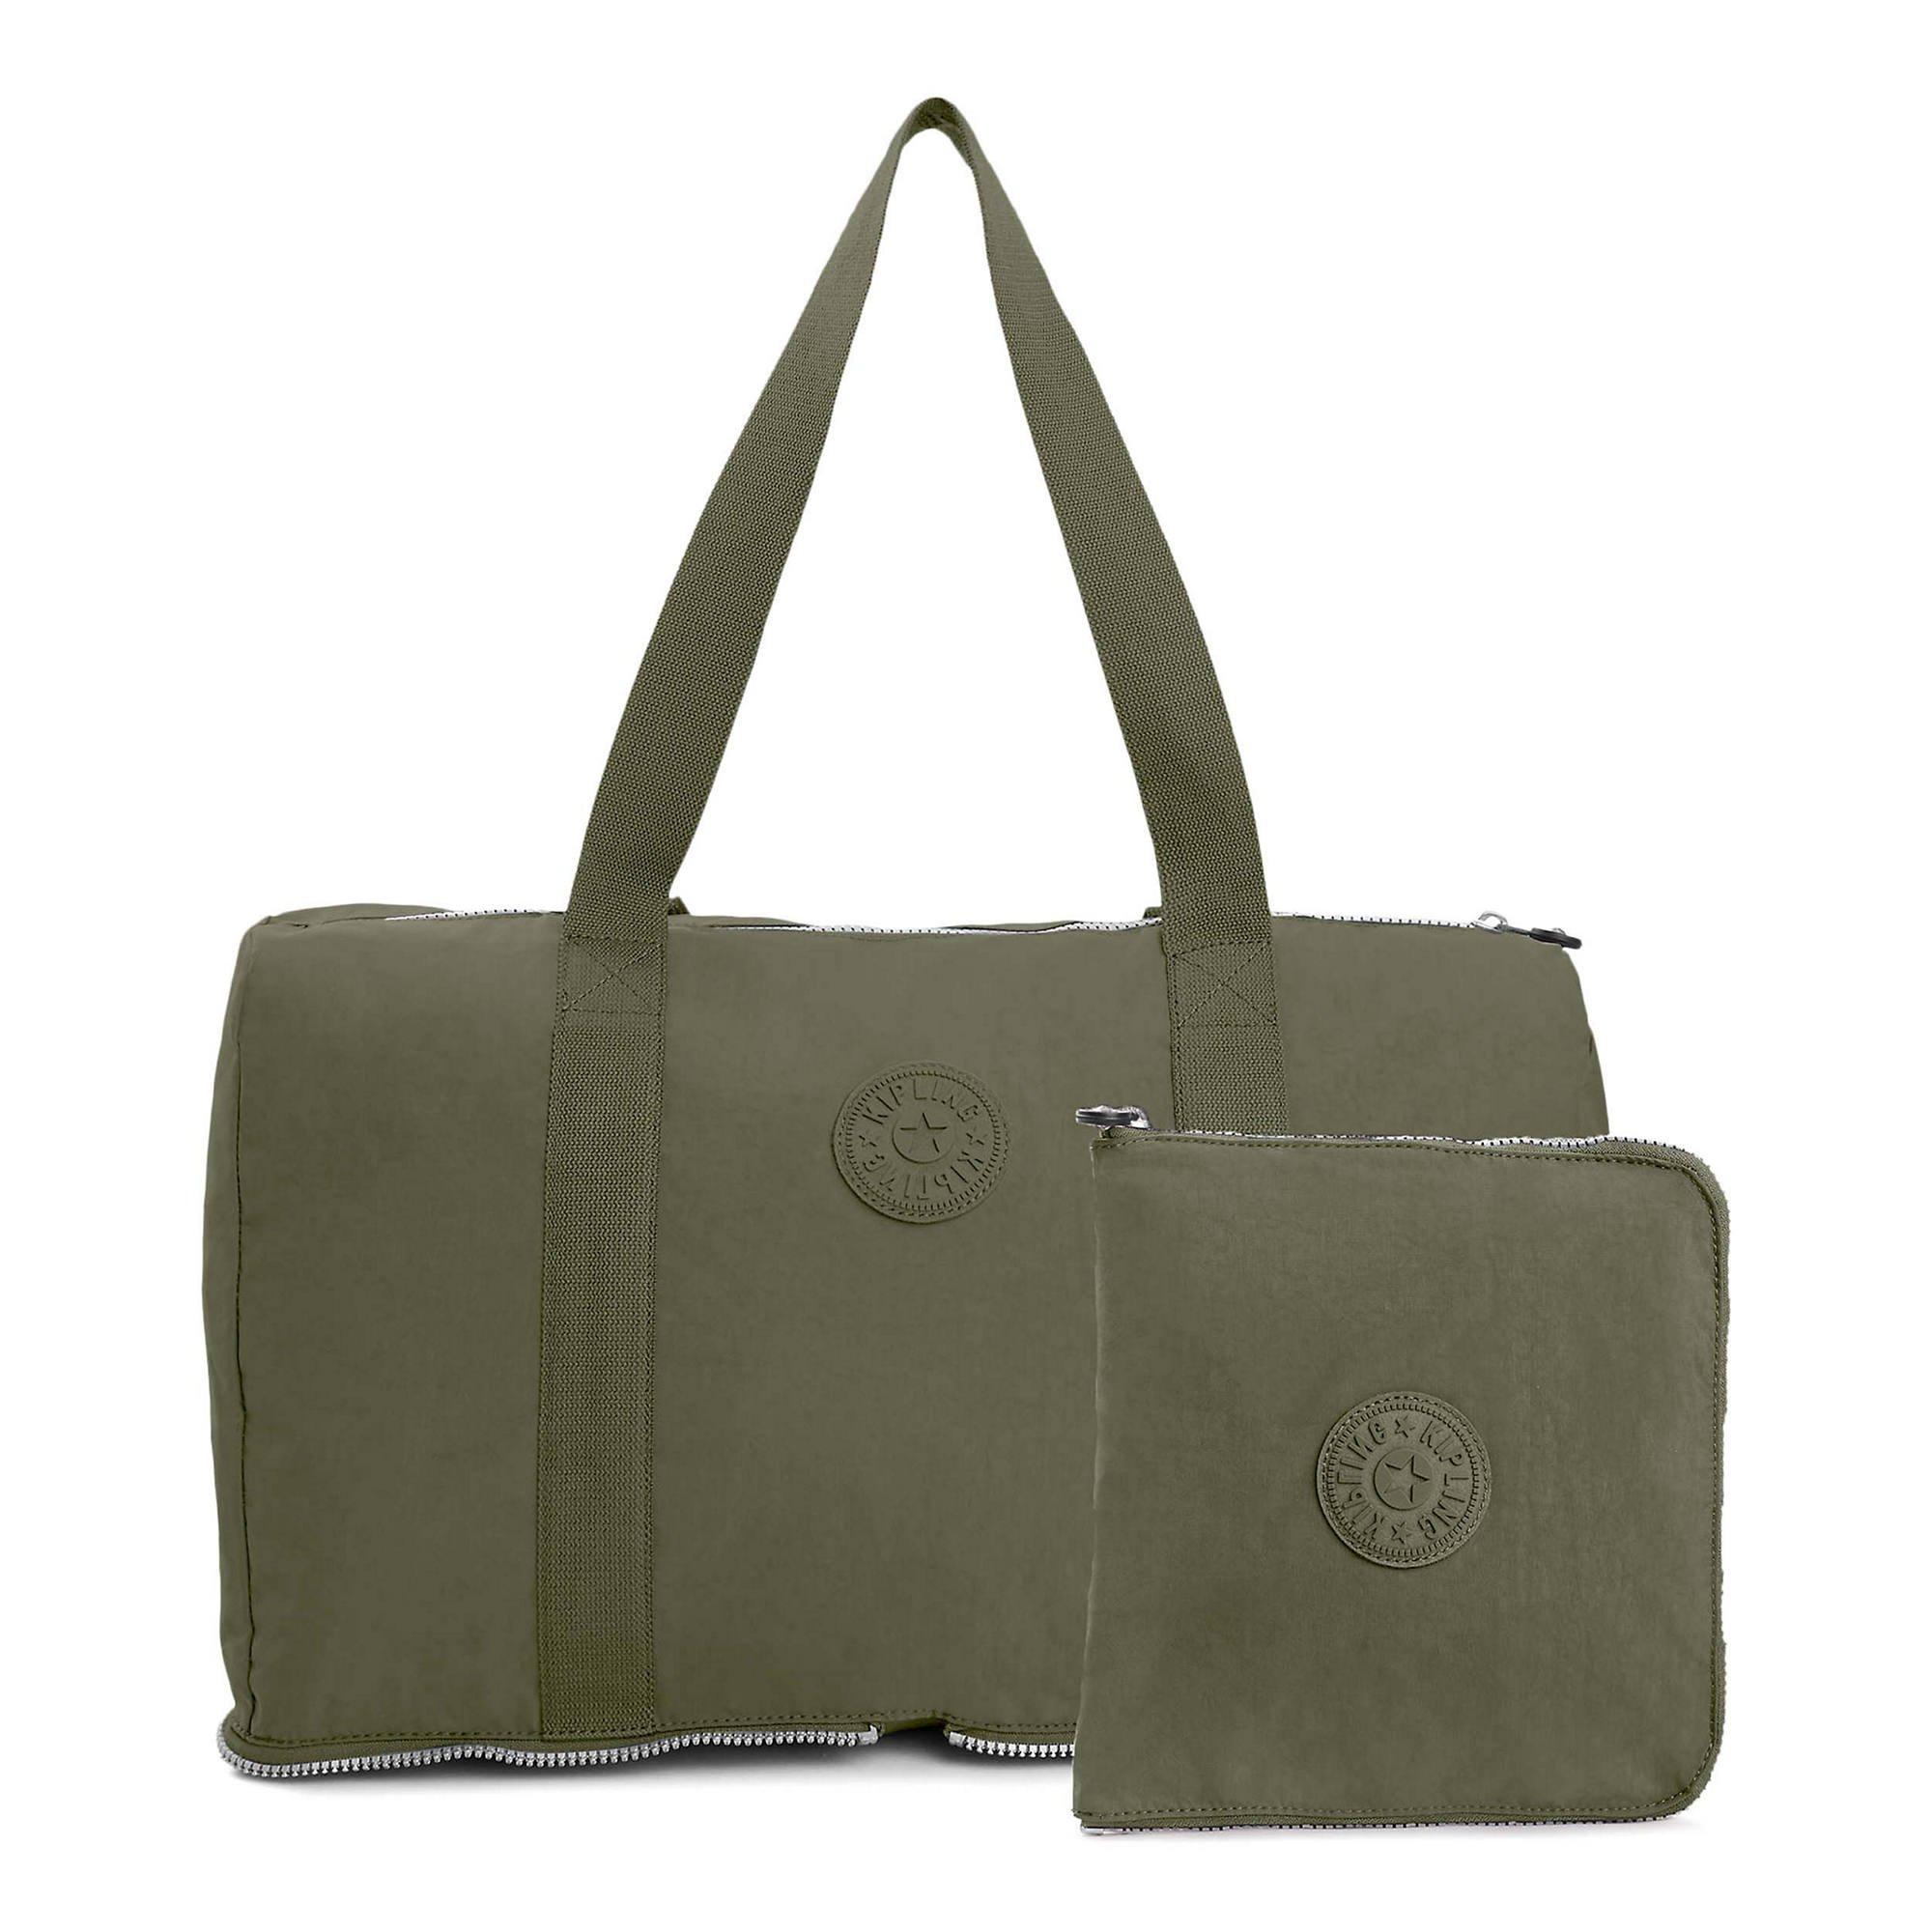 Kipling Honest Foldable Duffel Essential Travel Bag, Jaded Green